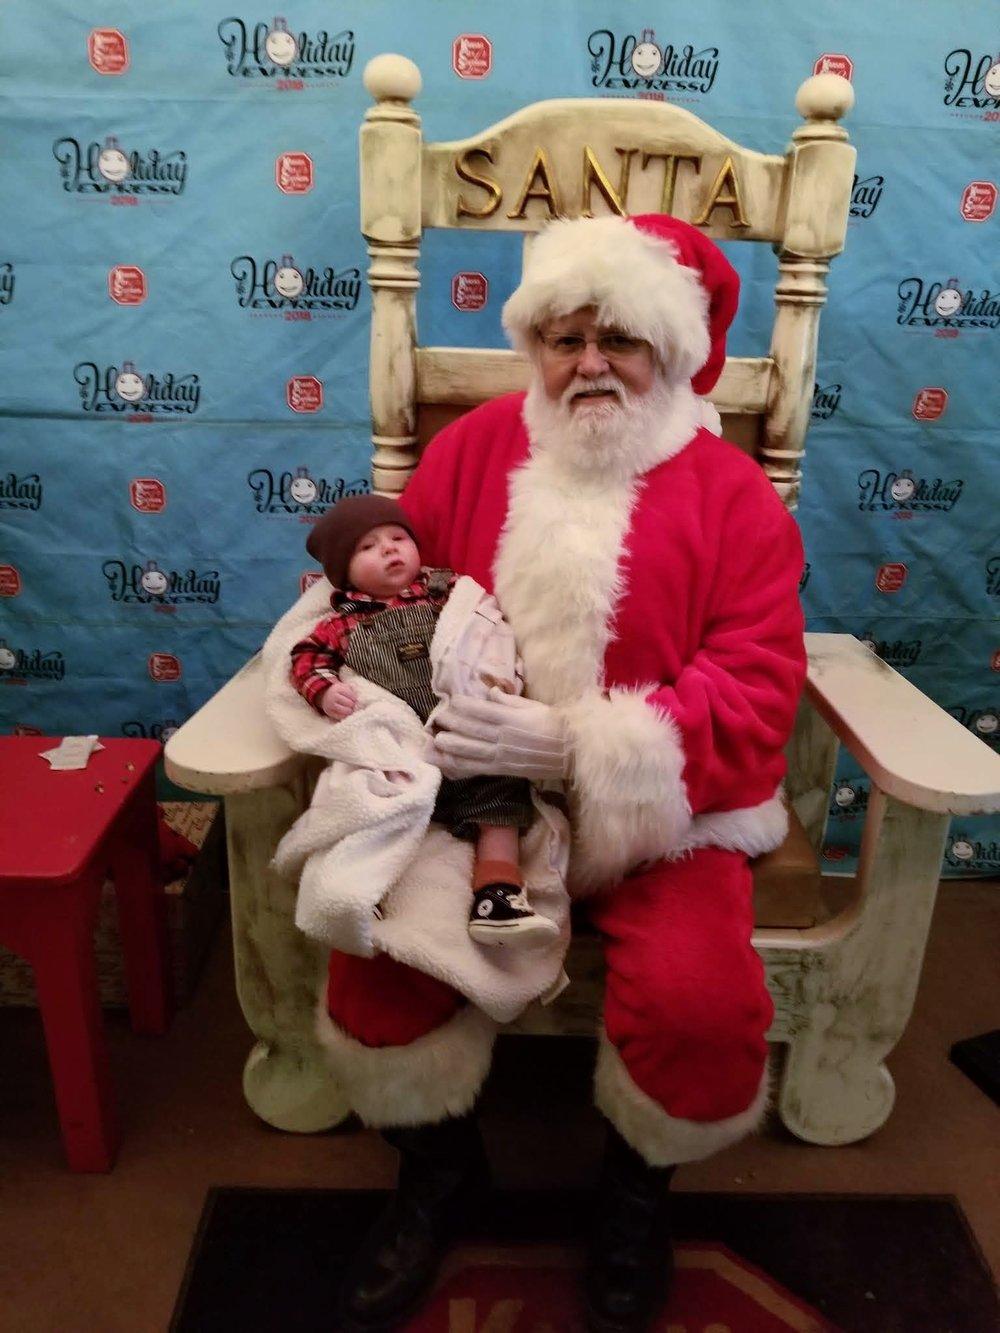 Kimberly Aker Photography | Bossier City Boudoir & Lifestyle Portrait Photographer| Shreveport Boudoir & Lifestyle Portrait Photographer | New Christmas Traditions with Floyd